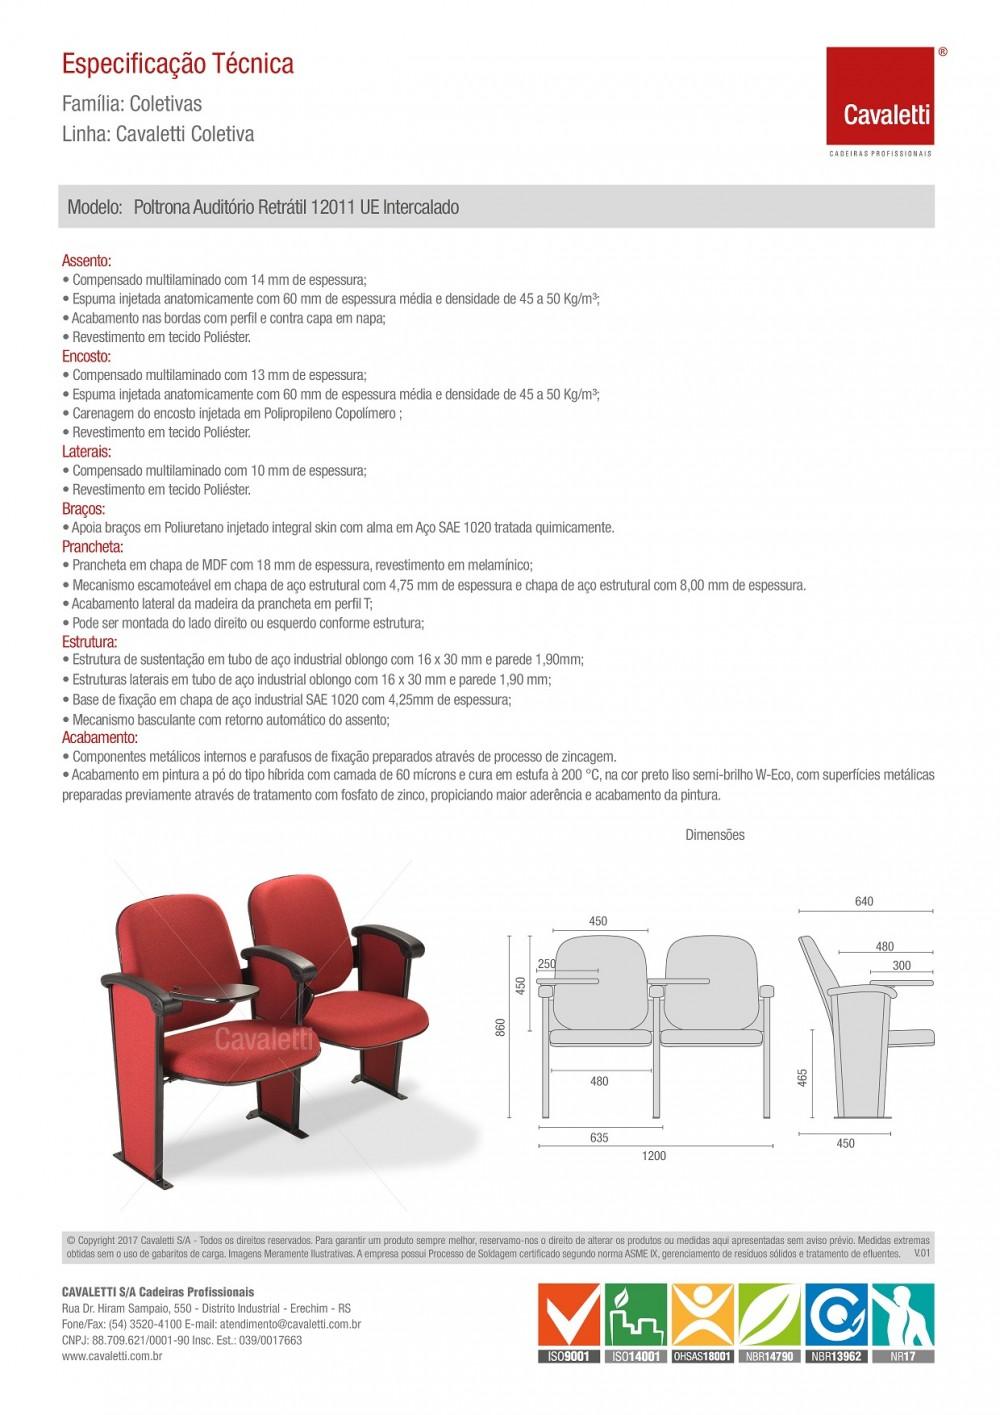 Poltrona Auditório 12011 Retrátil - Braço Intercalado - Prancheta Melamínico -  Linha Coletiva - Cavaletti -